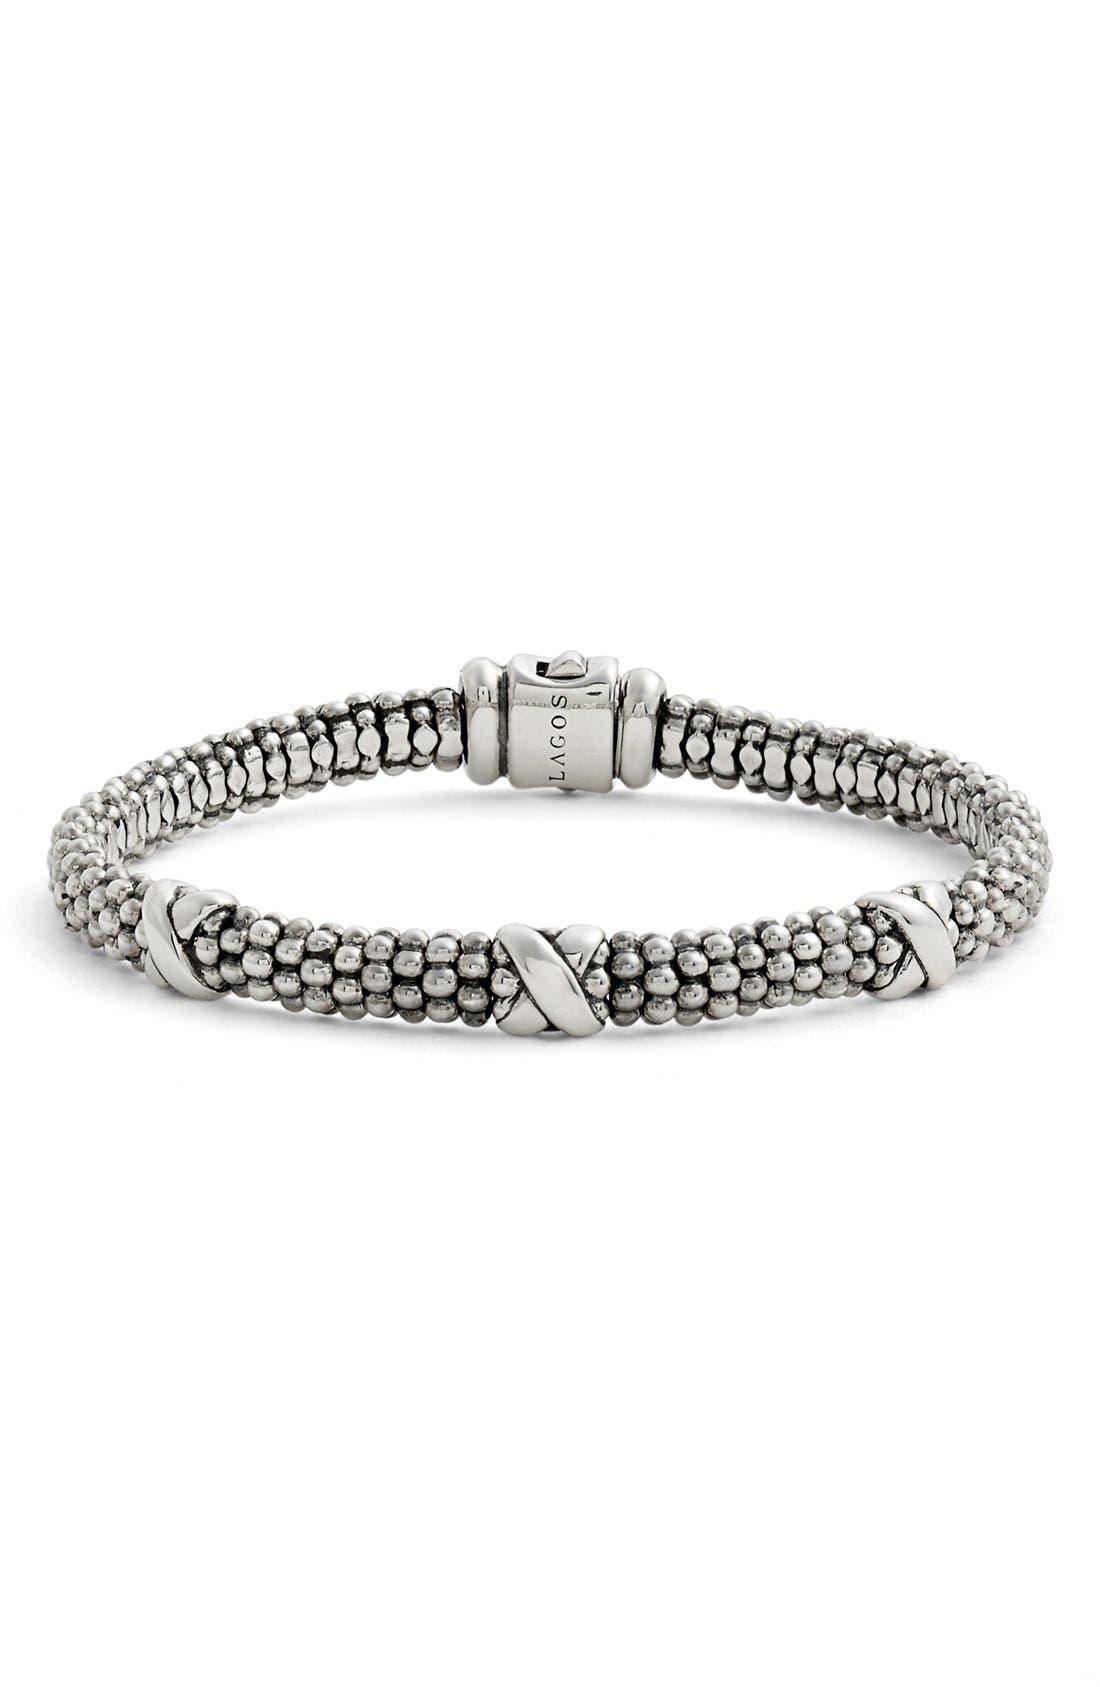 Main Image - LAGOS 'Signature Caviar' Mini Oval Rope Bracelet